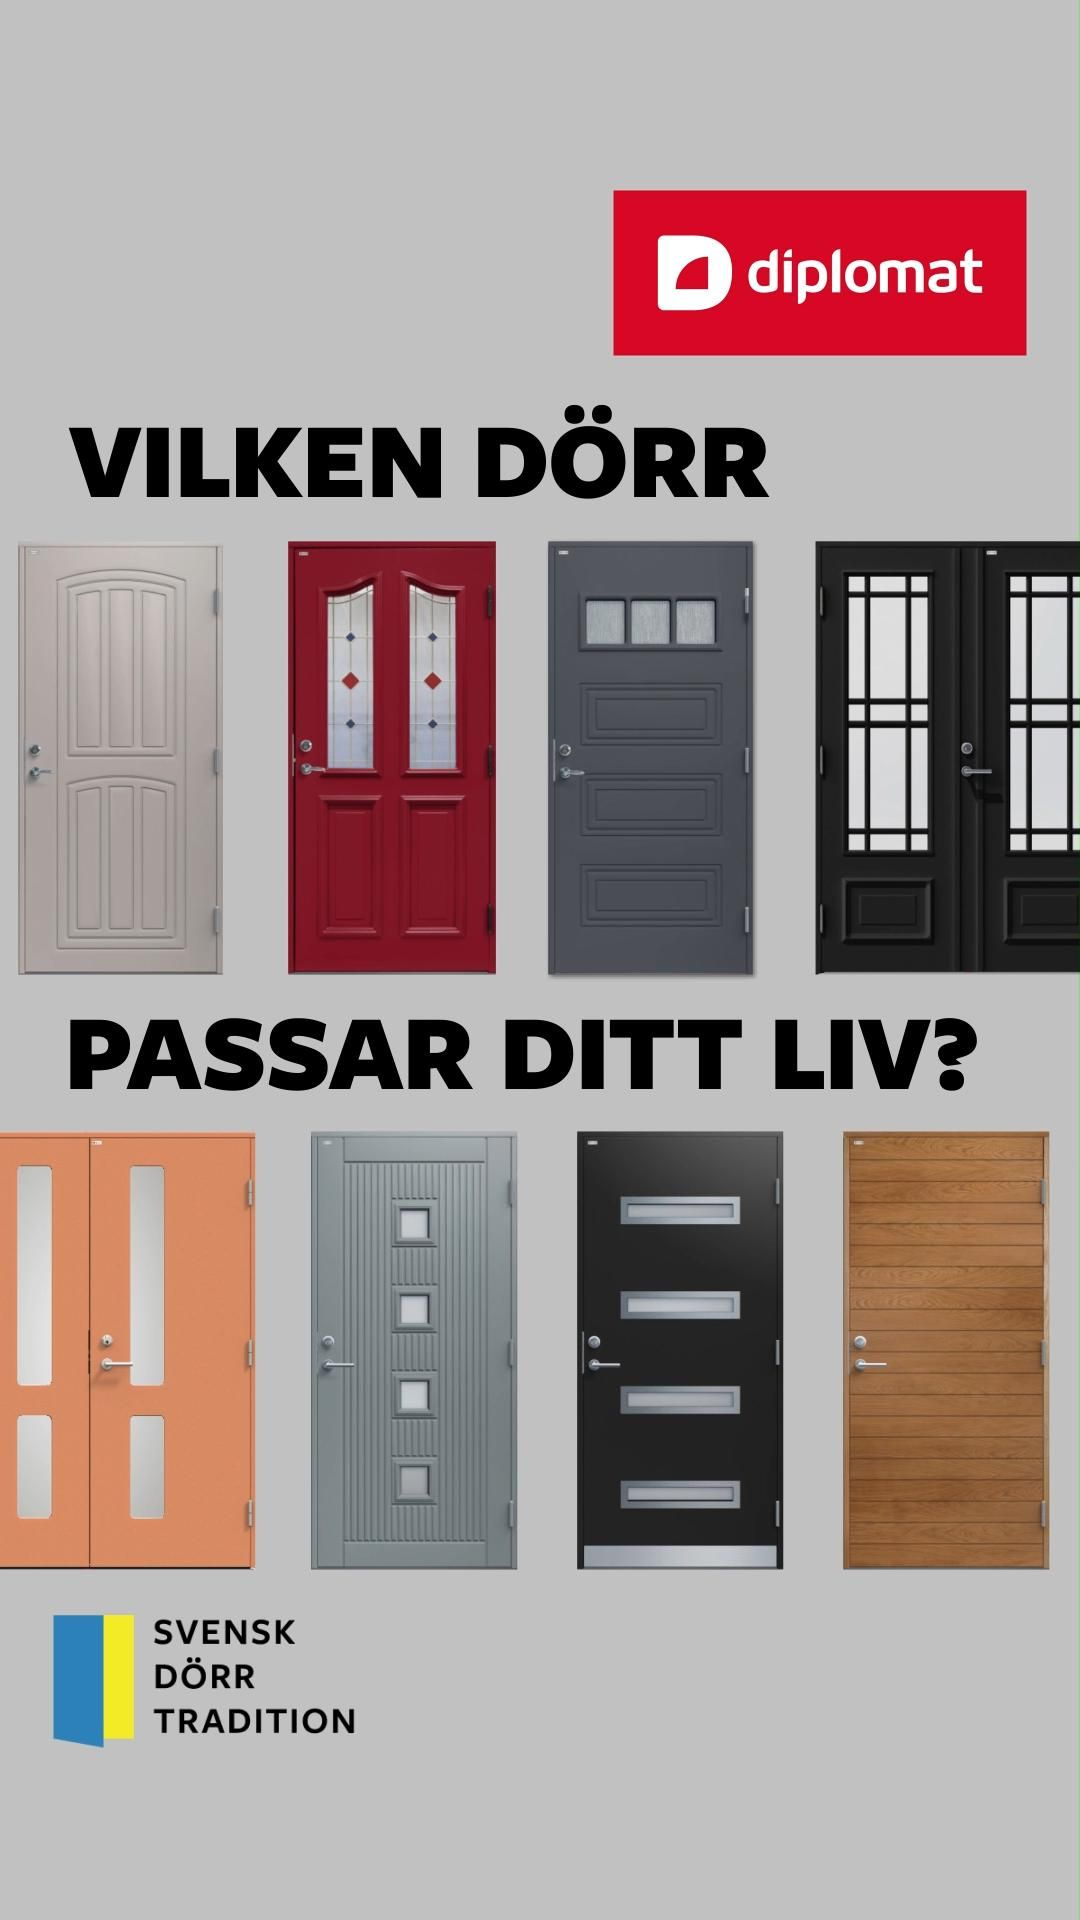 Vilken dörr passar ditt liv?